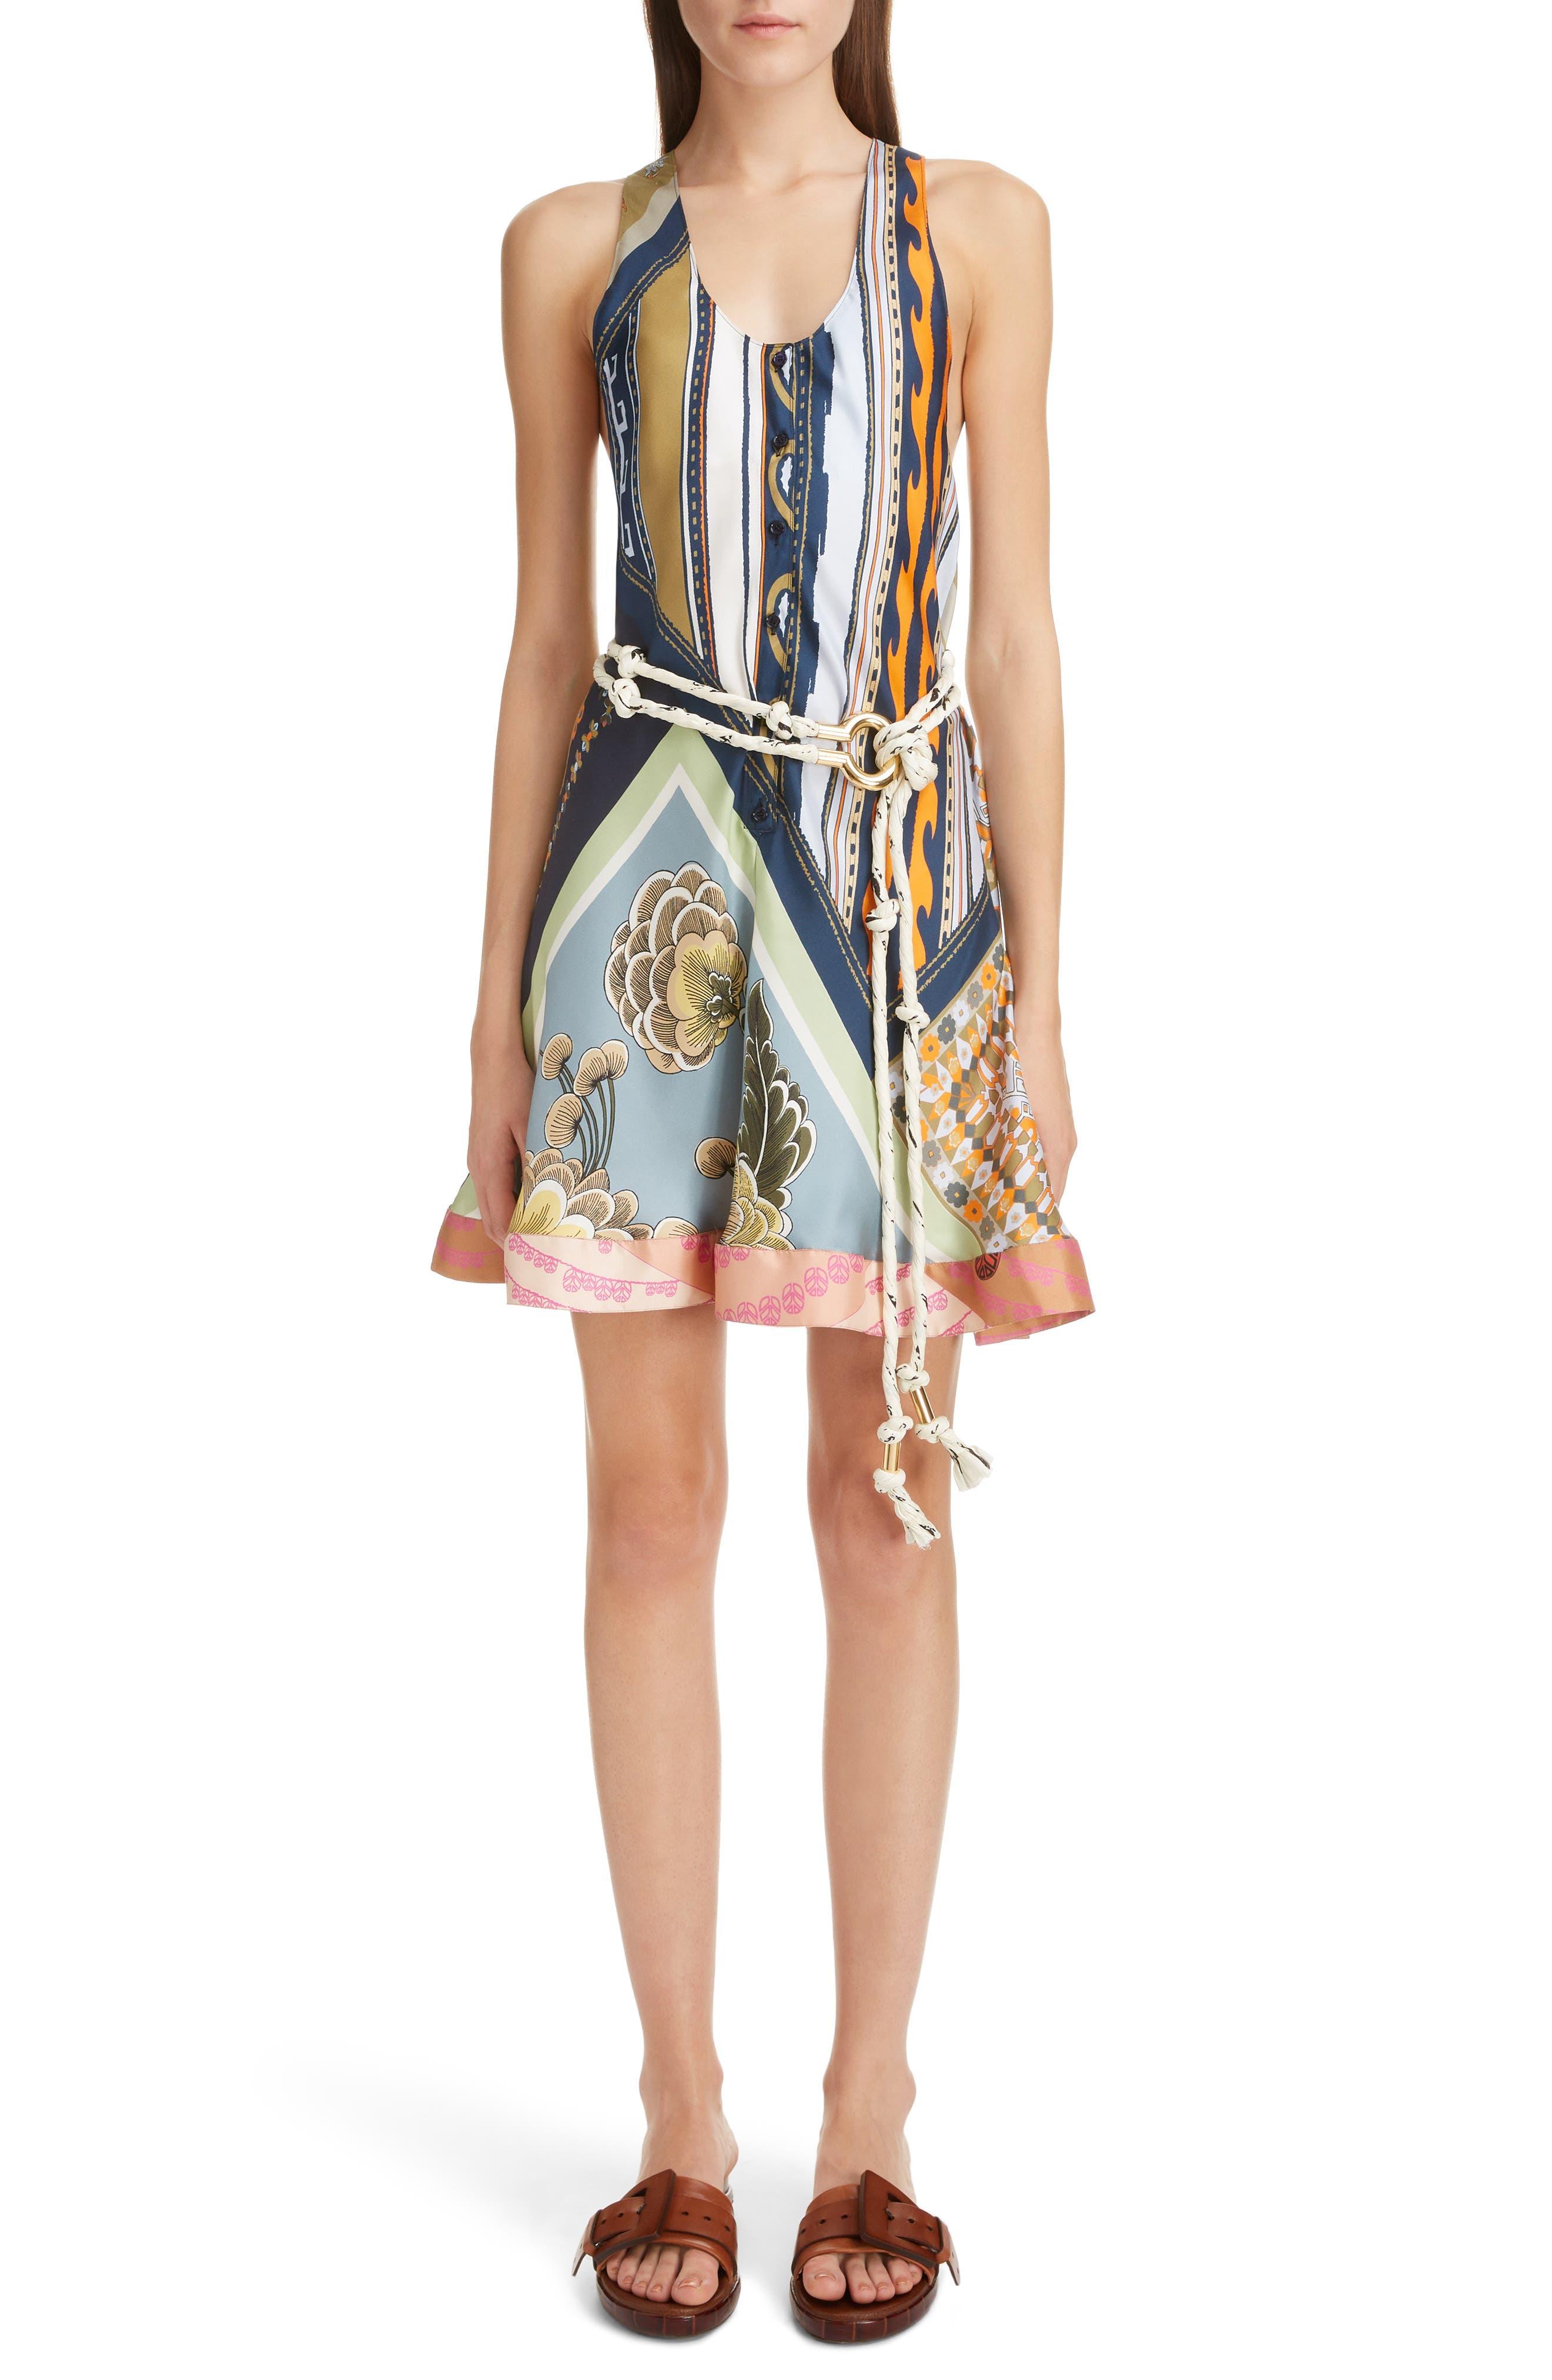 CHLOÉ,                             Caravan Print Silk Racerback Dress,                             Main thumbnail 1, color,                             MULTICOLOR BLUE